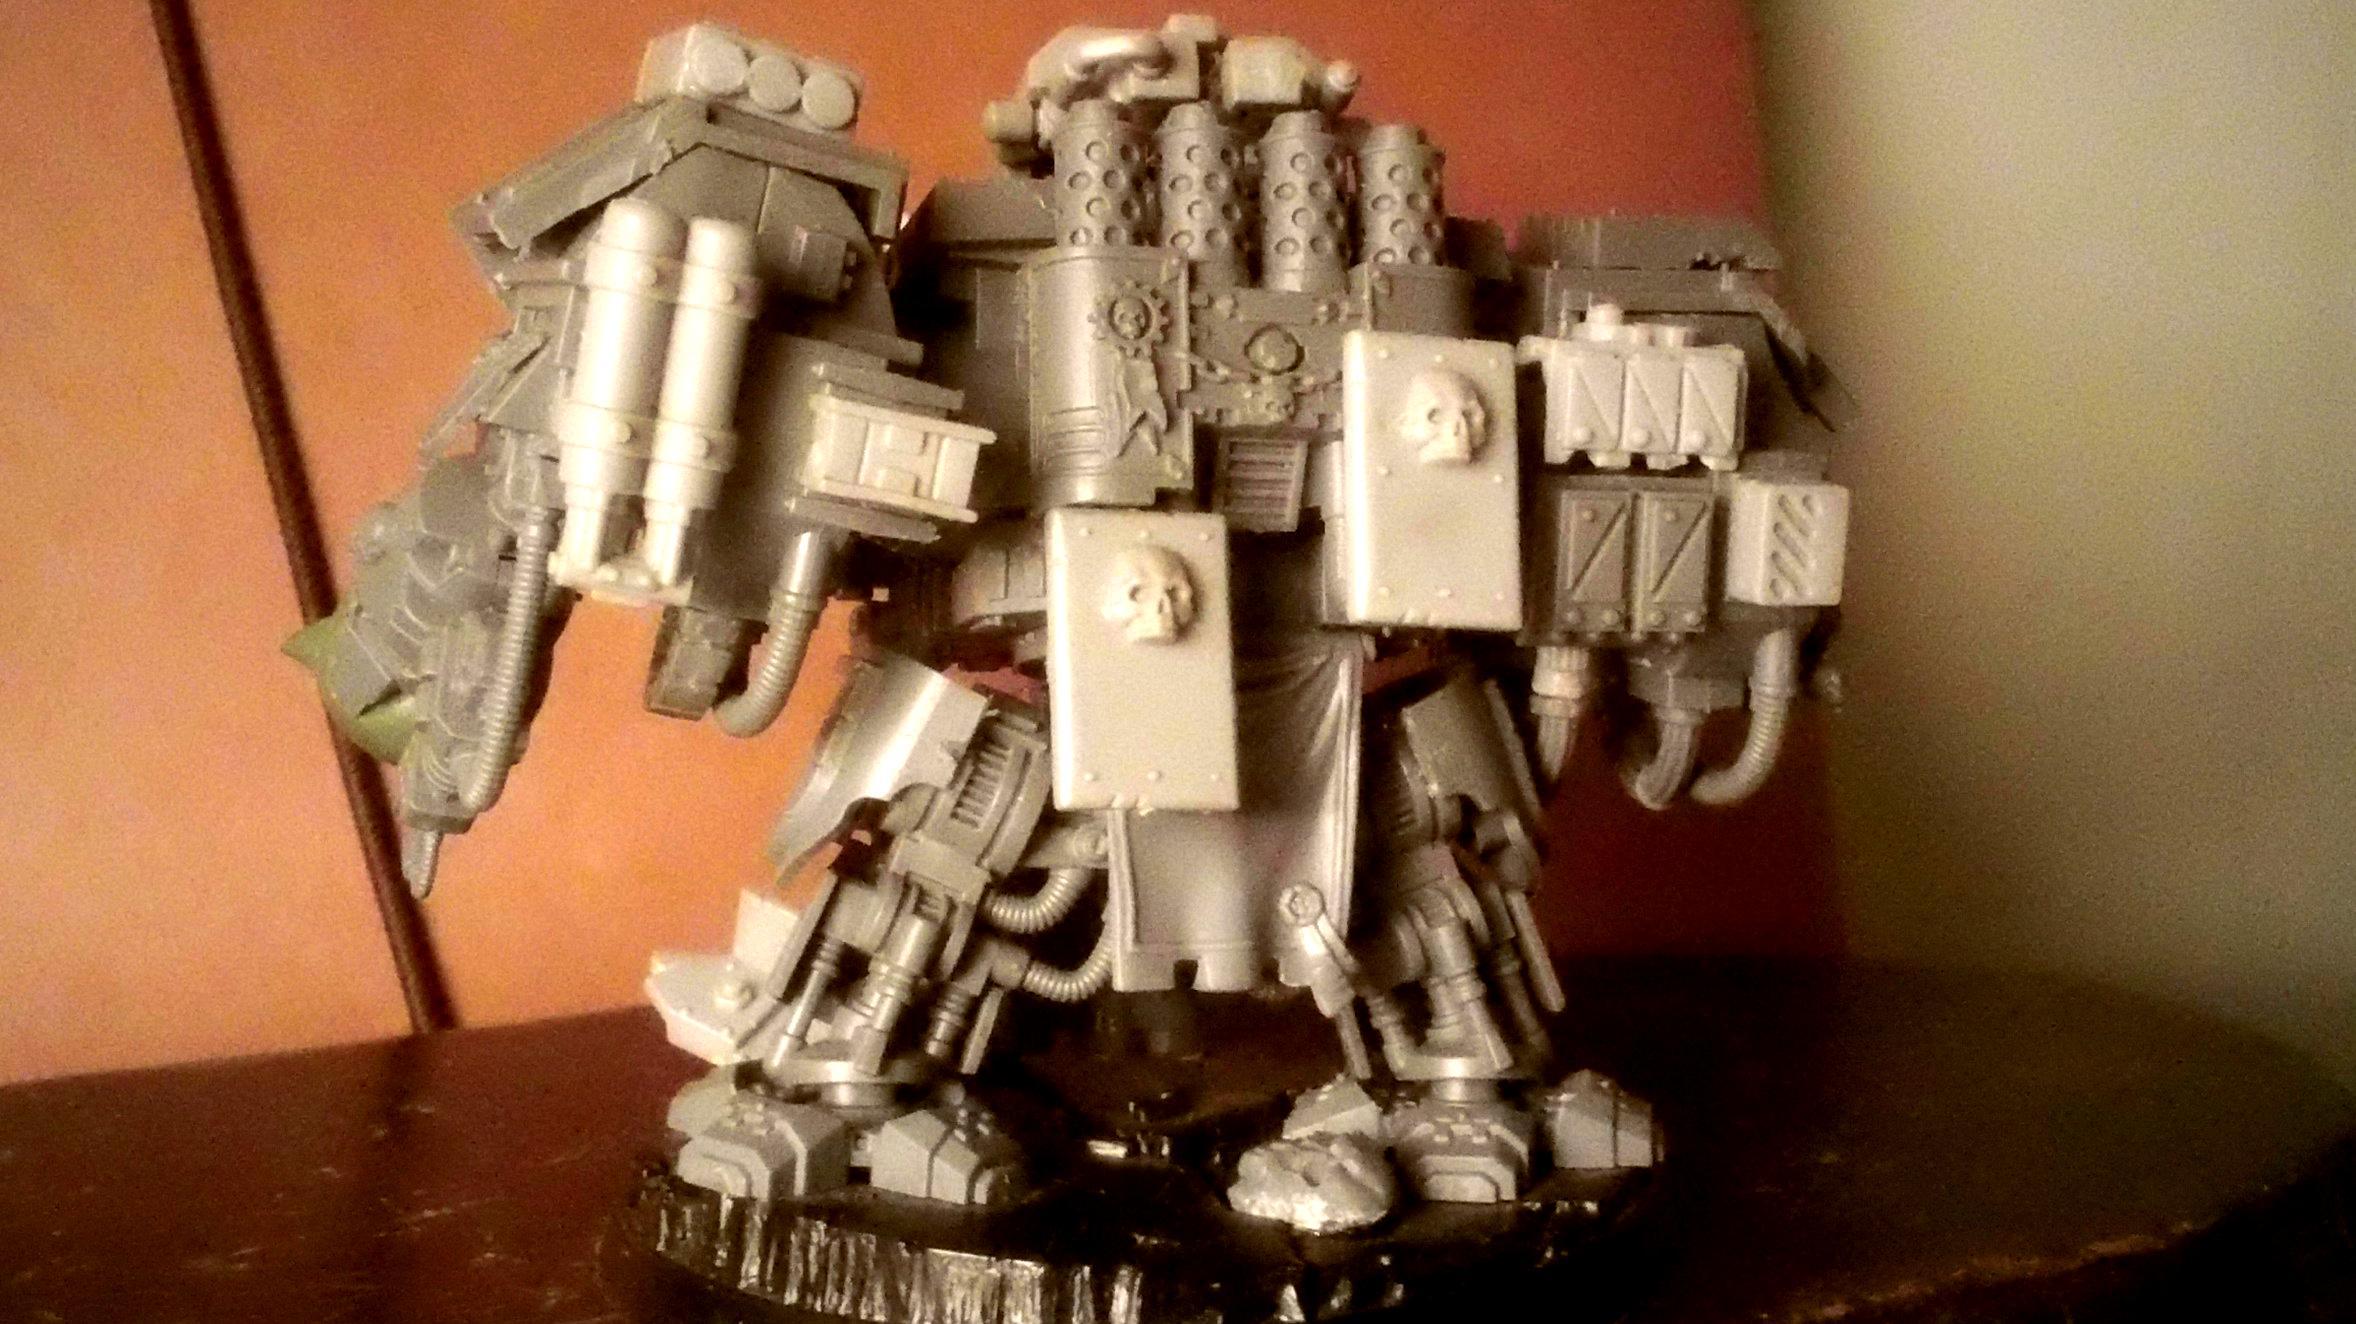 Adeptus, Armor, Conversion, Dreadnought, Extra, Mechanicus, Work In Progress